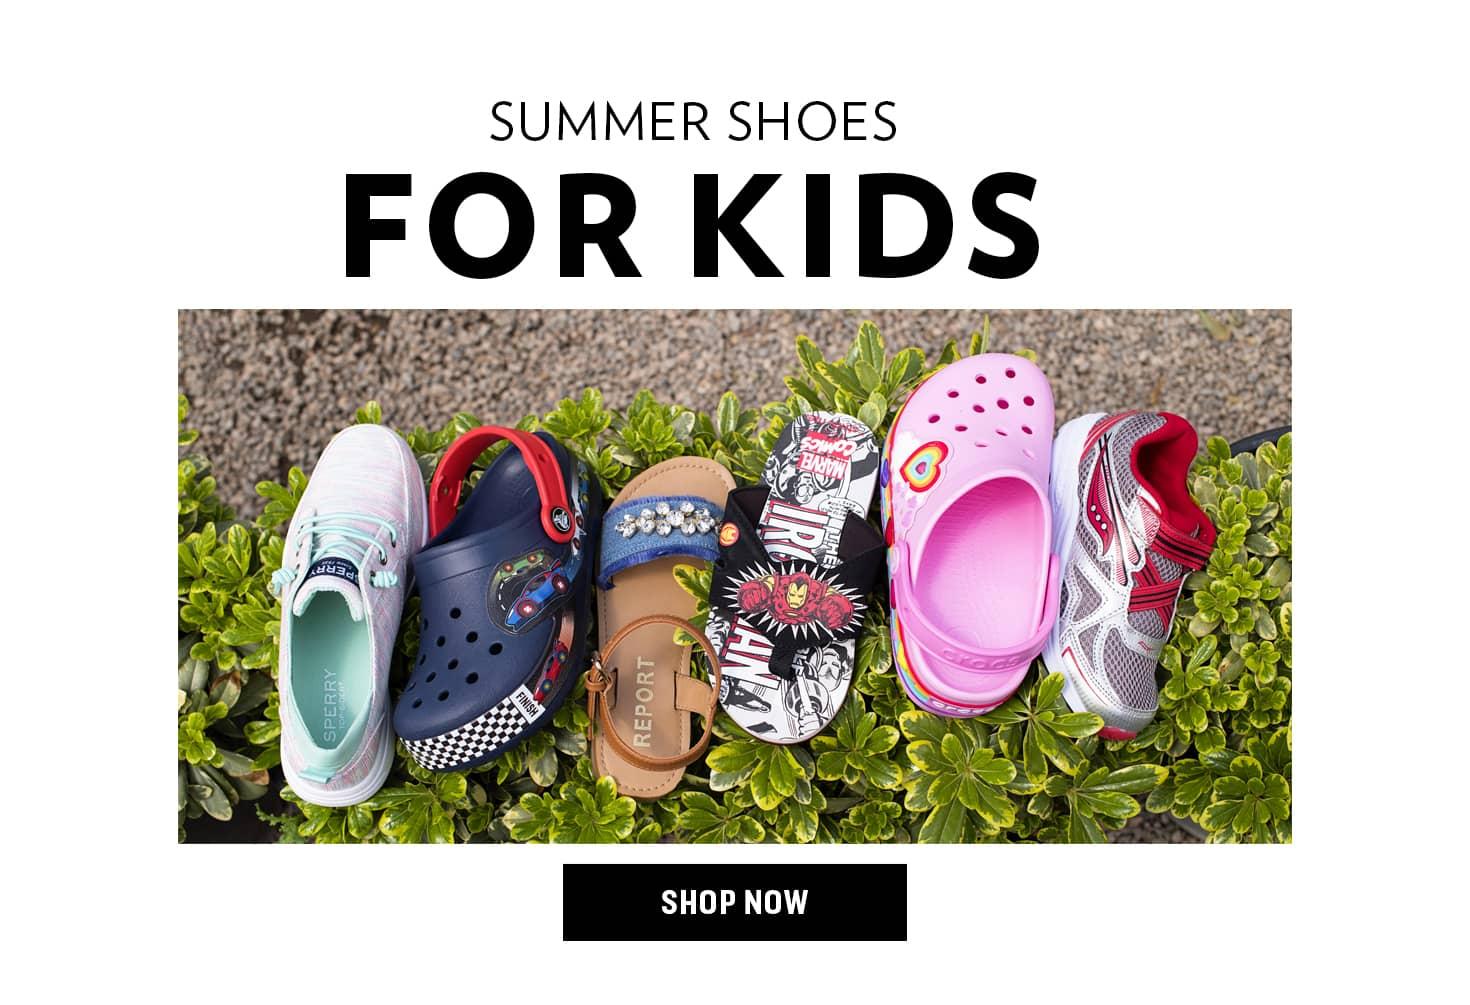 Shop Kids' Summer Shoes